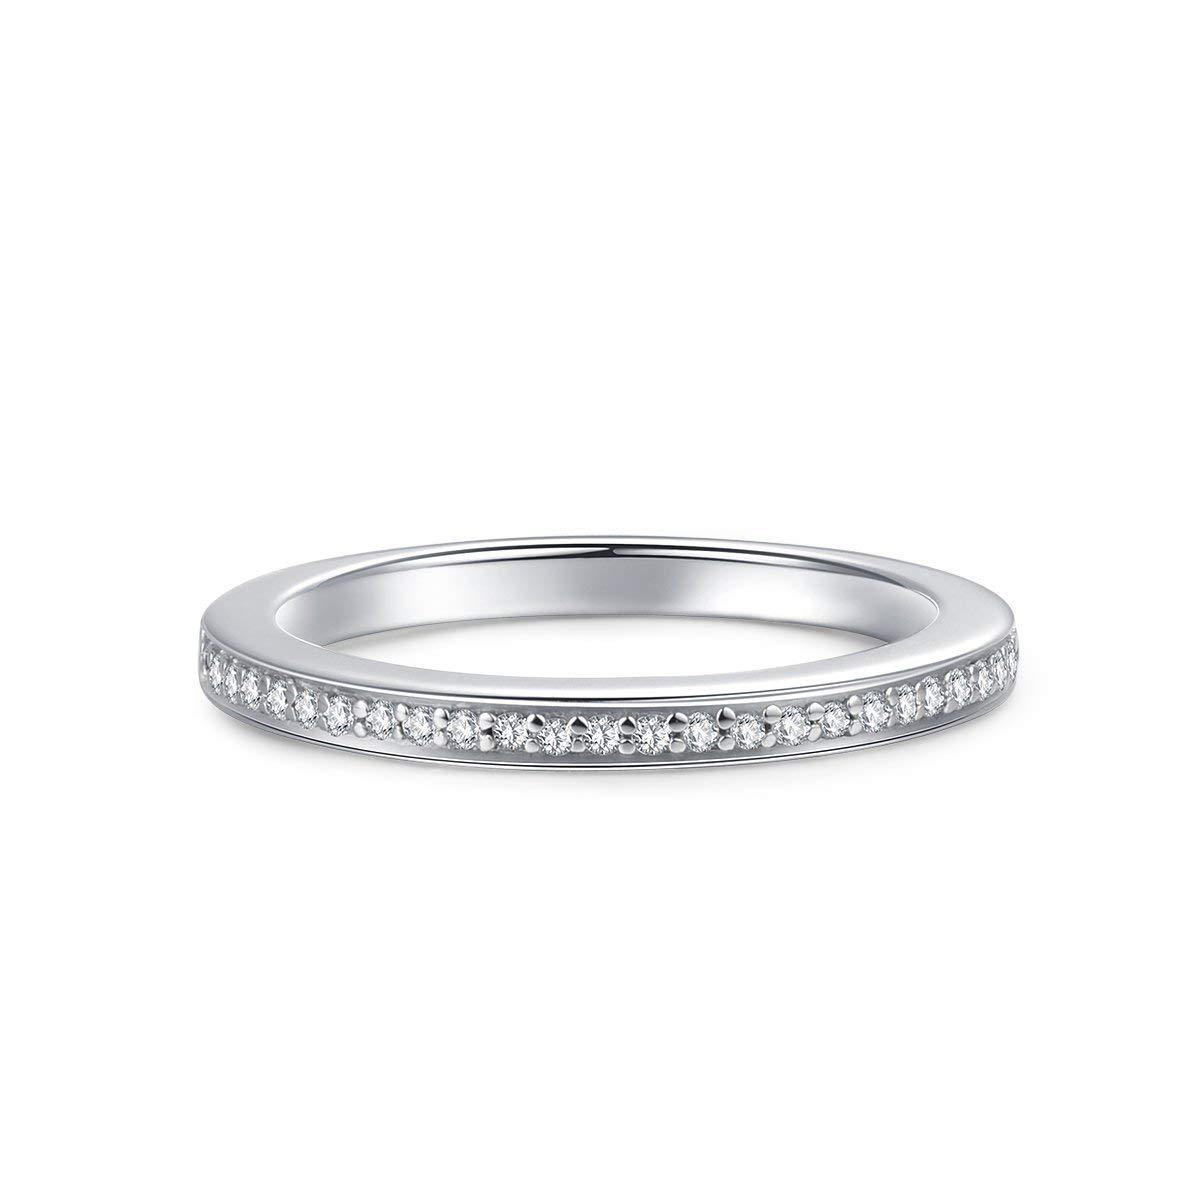 Hafeez Center 2.0mm Rhodium Plated Sterling Silver Micropave Cubic Zirconia CZ Half Eternity Wedding Ring (8)